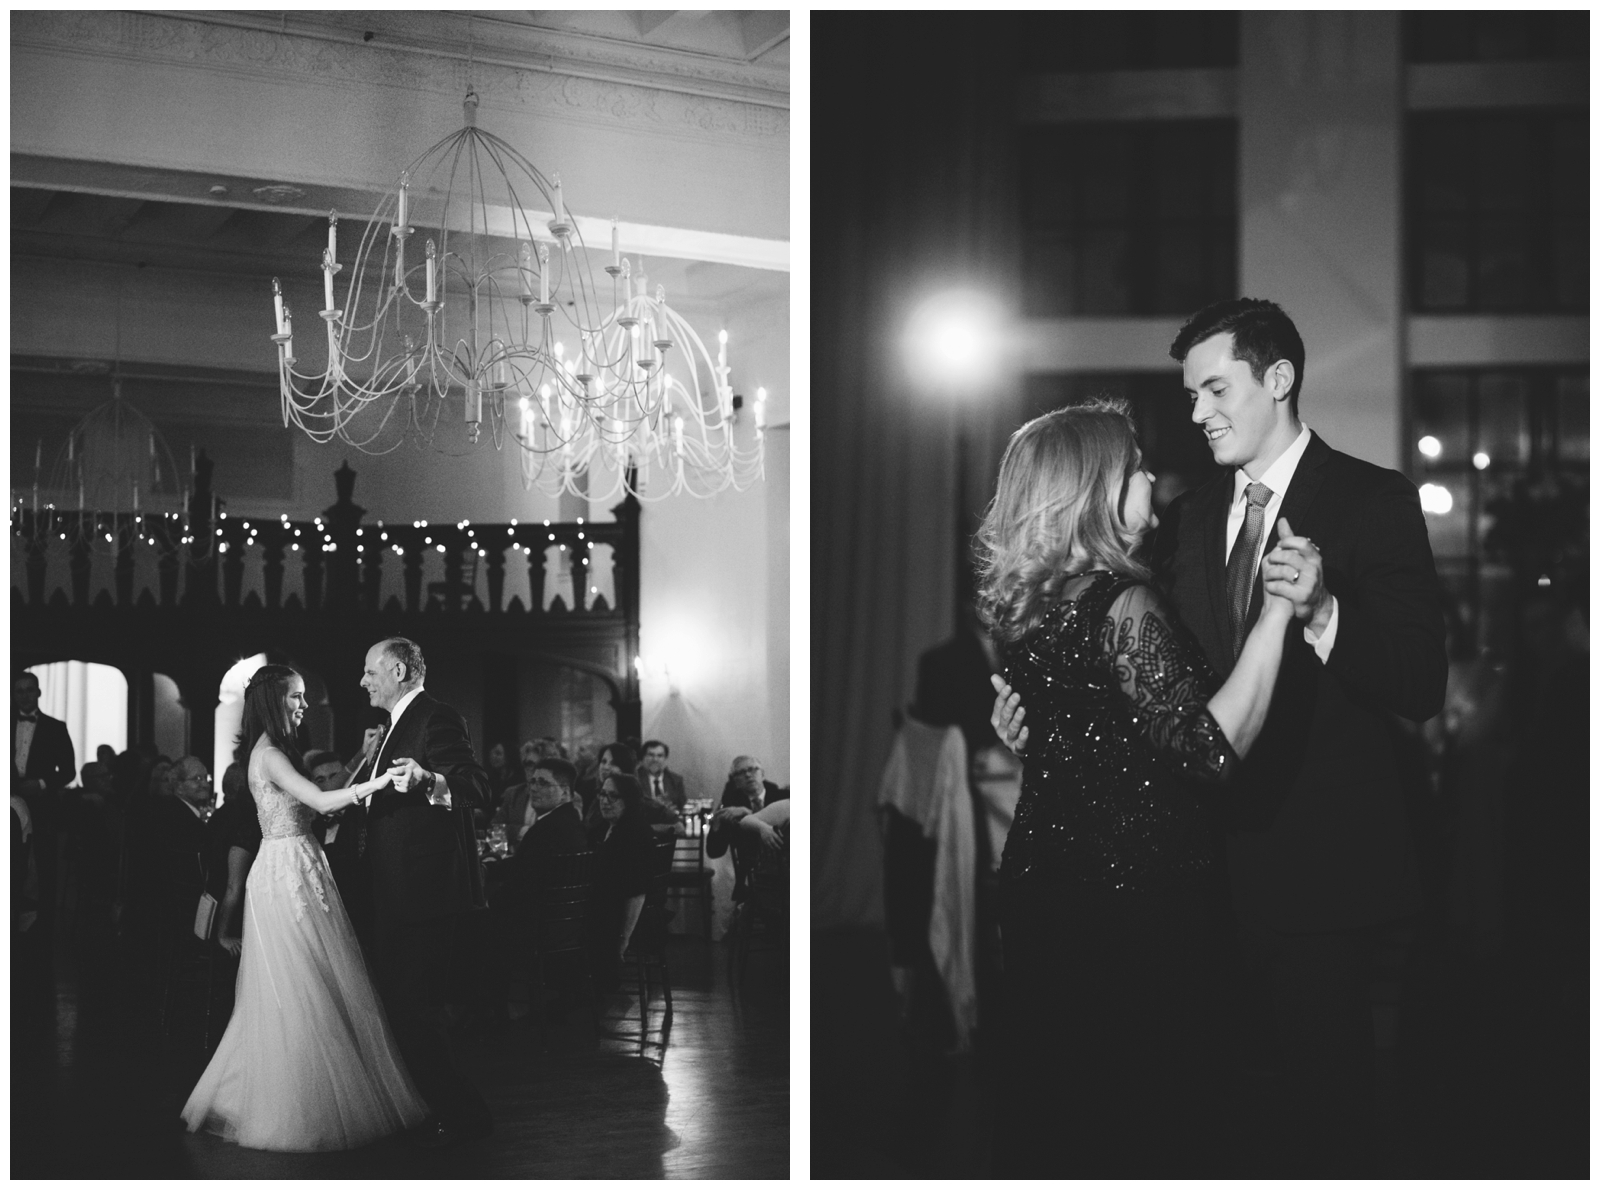 Alden-Castle-Wedding-Boston-Bailey-Q-Photo-058.jpg